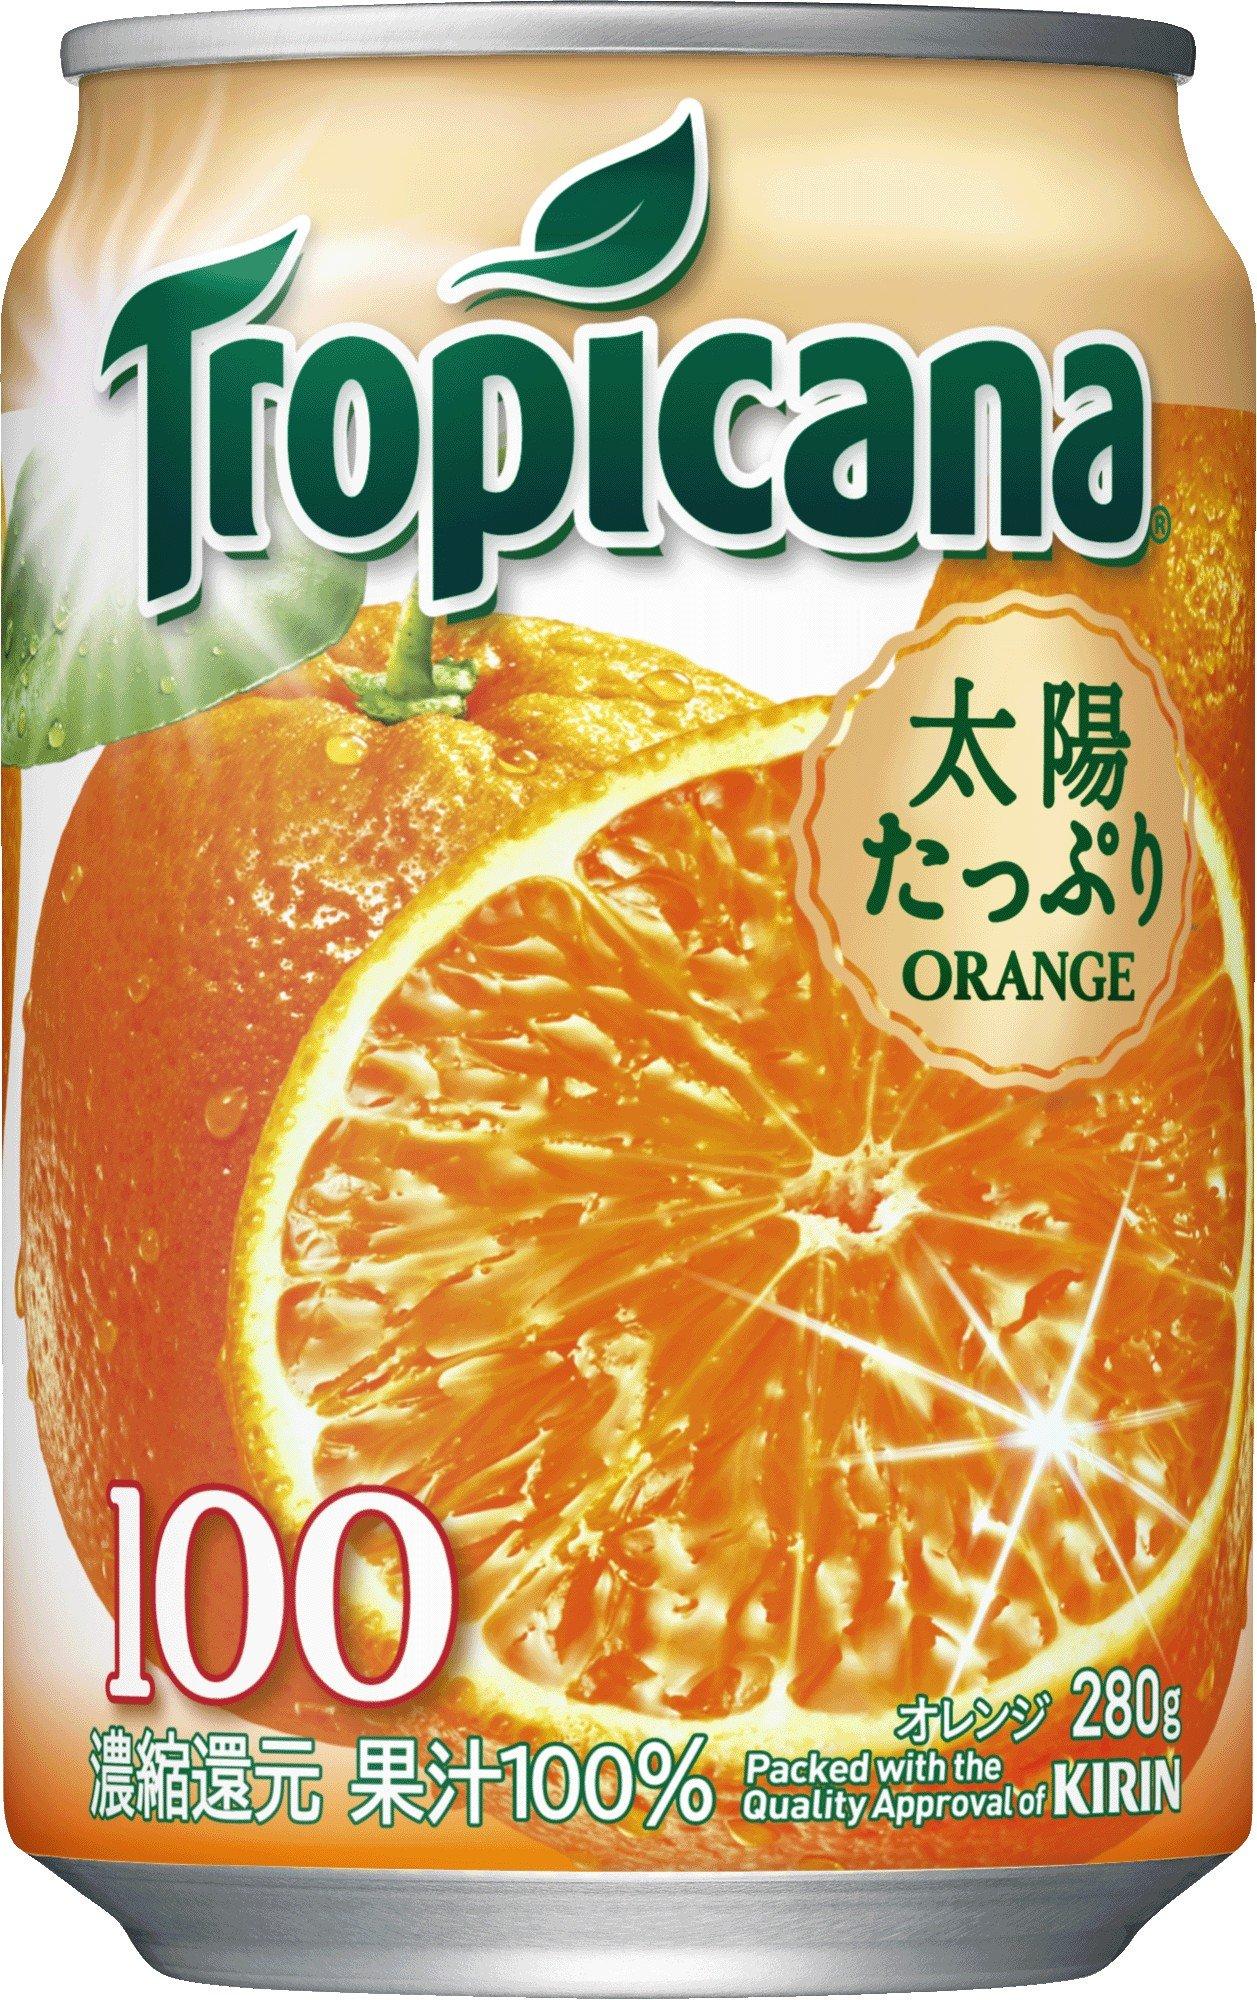 Tropicana This 100% Orange 280gX24